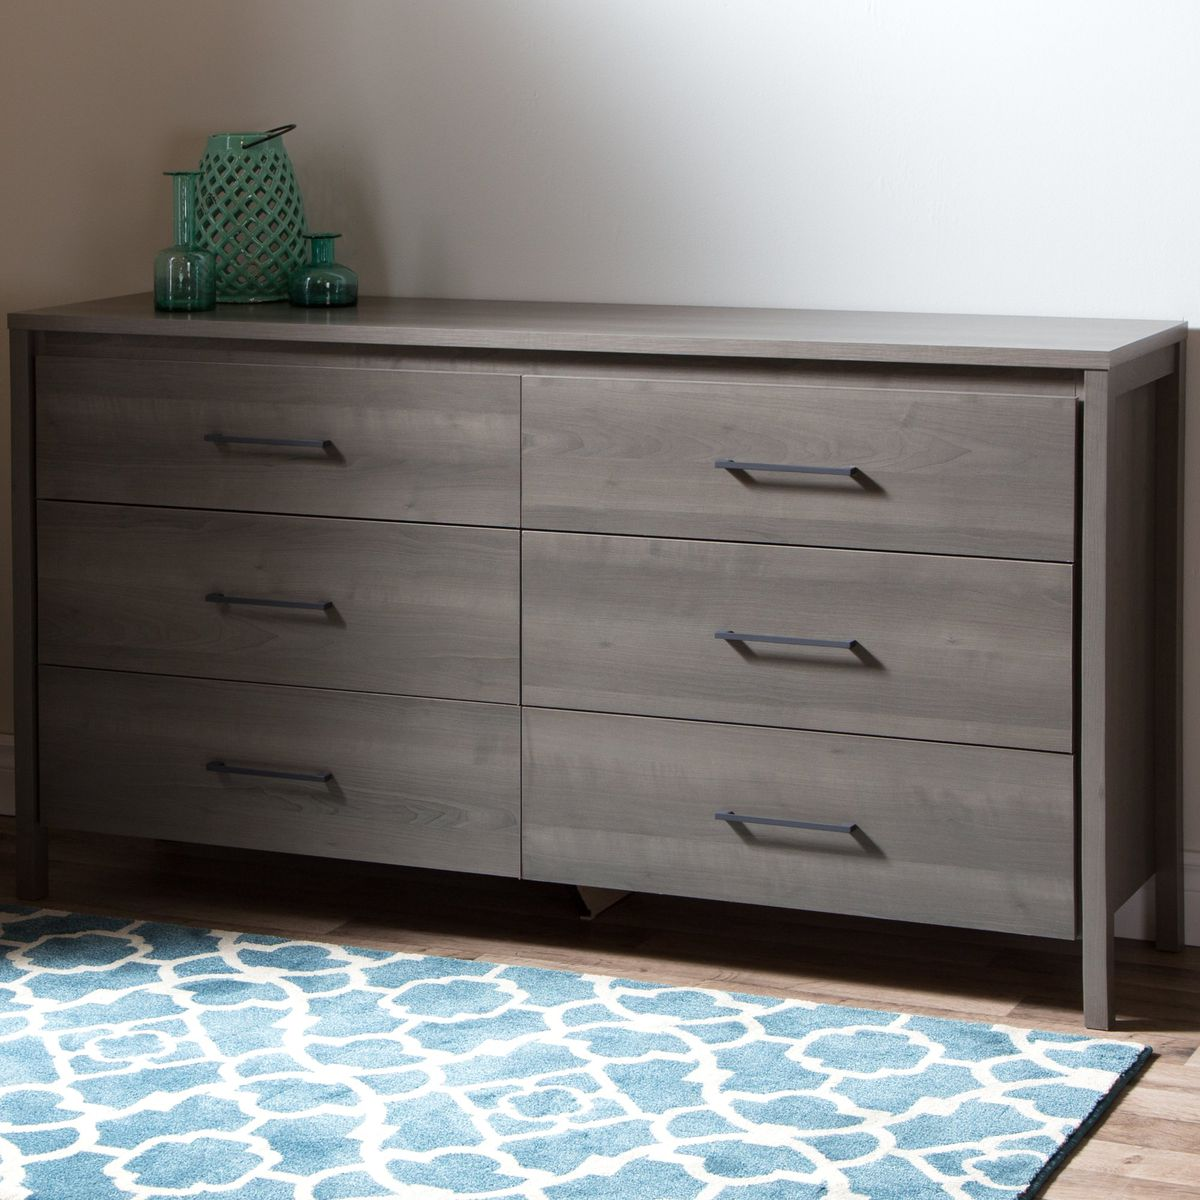 2modern Gravity 6 Drawer Double Dresser 287 99